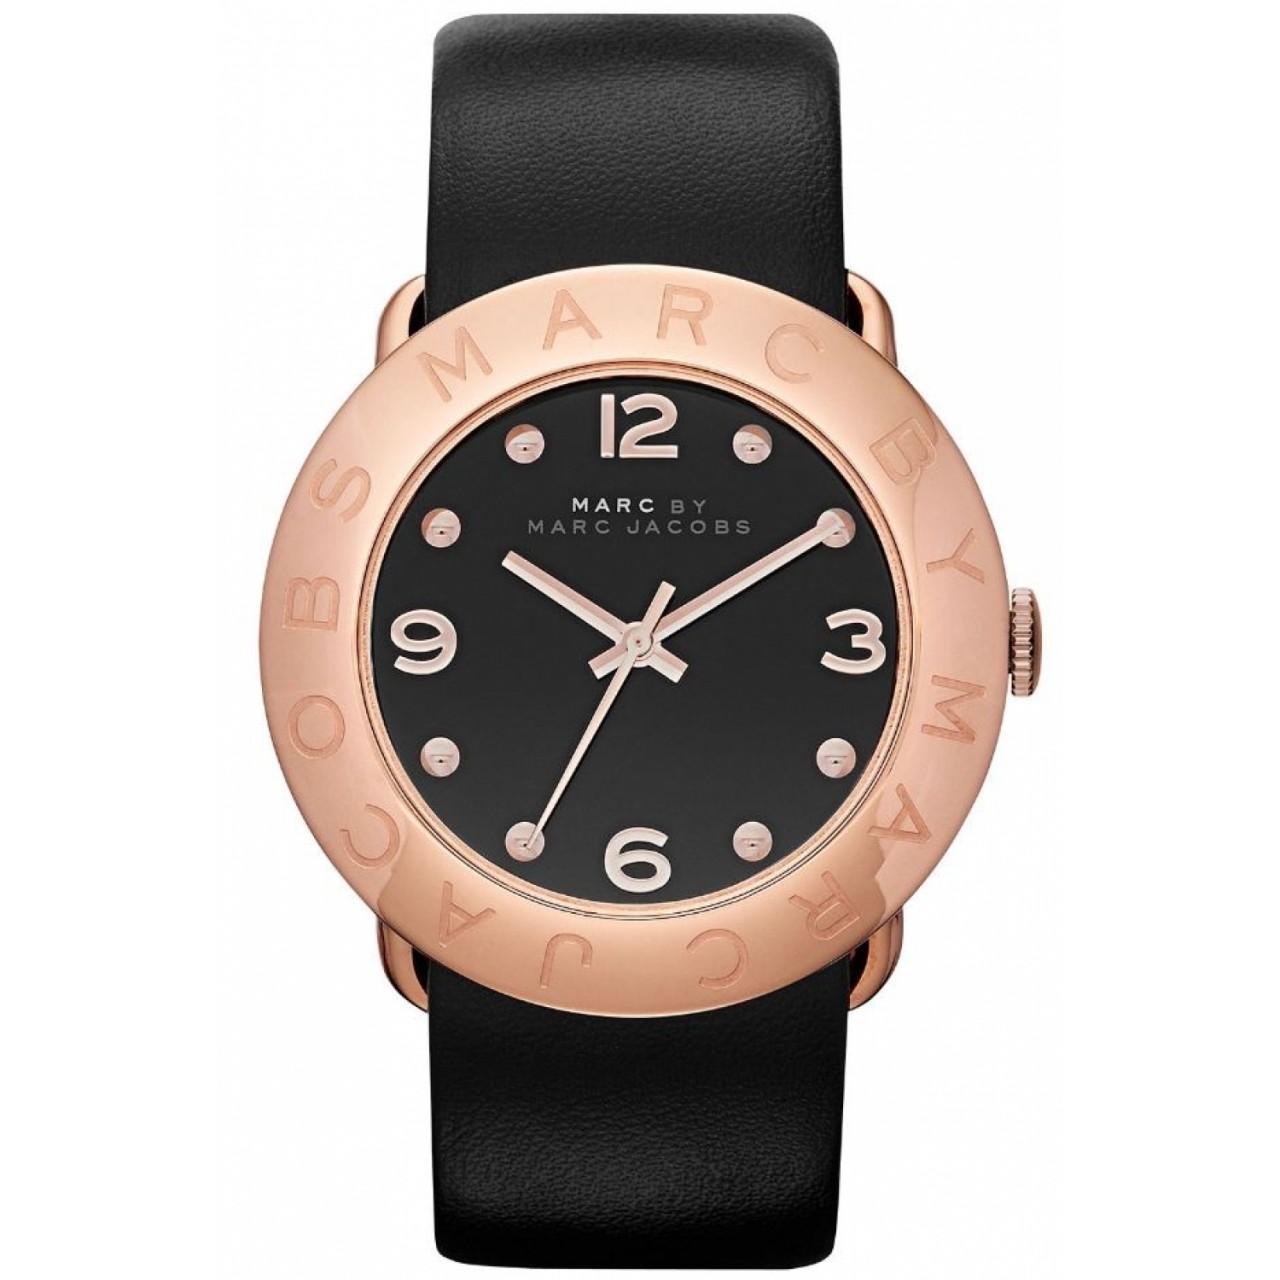 Marc by Marc Womens MBM1225 Black Leather Quartz Watch